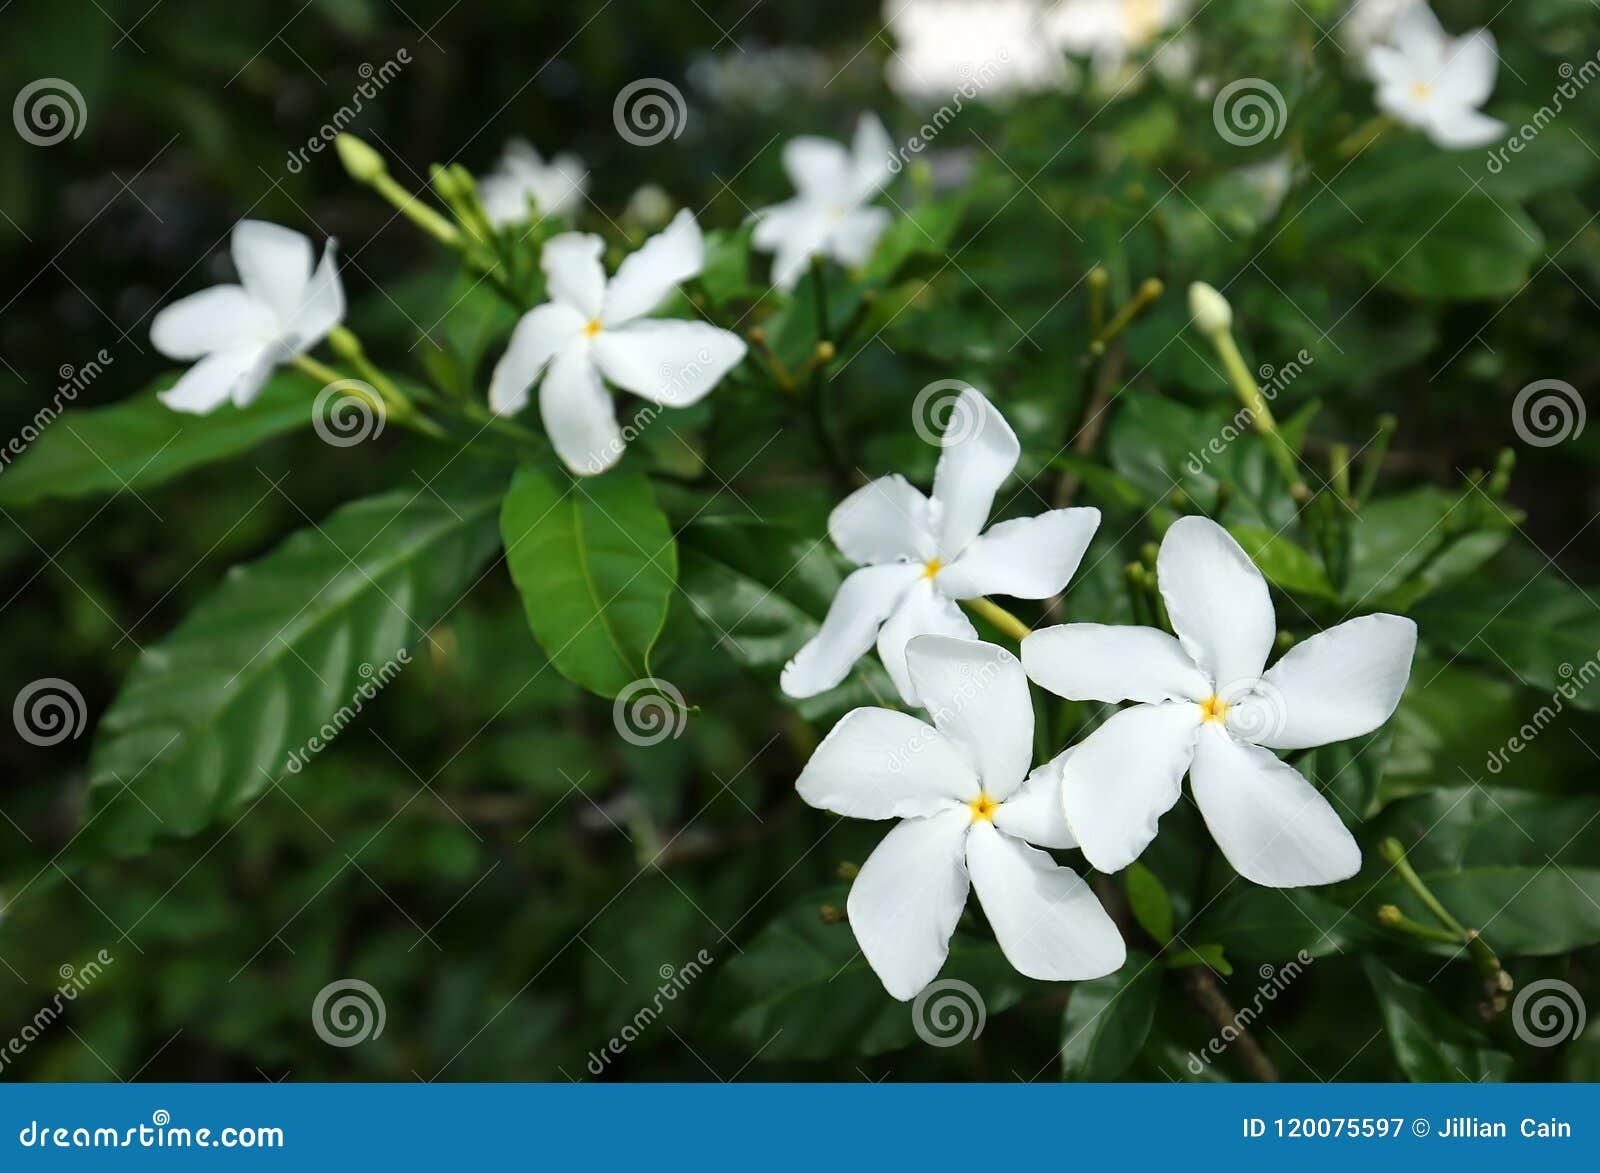 Pinwheel Jasmine Flowers Stock Image Image Of Flora 120075597